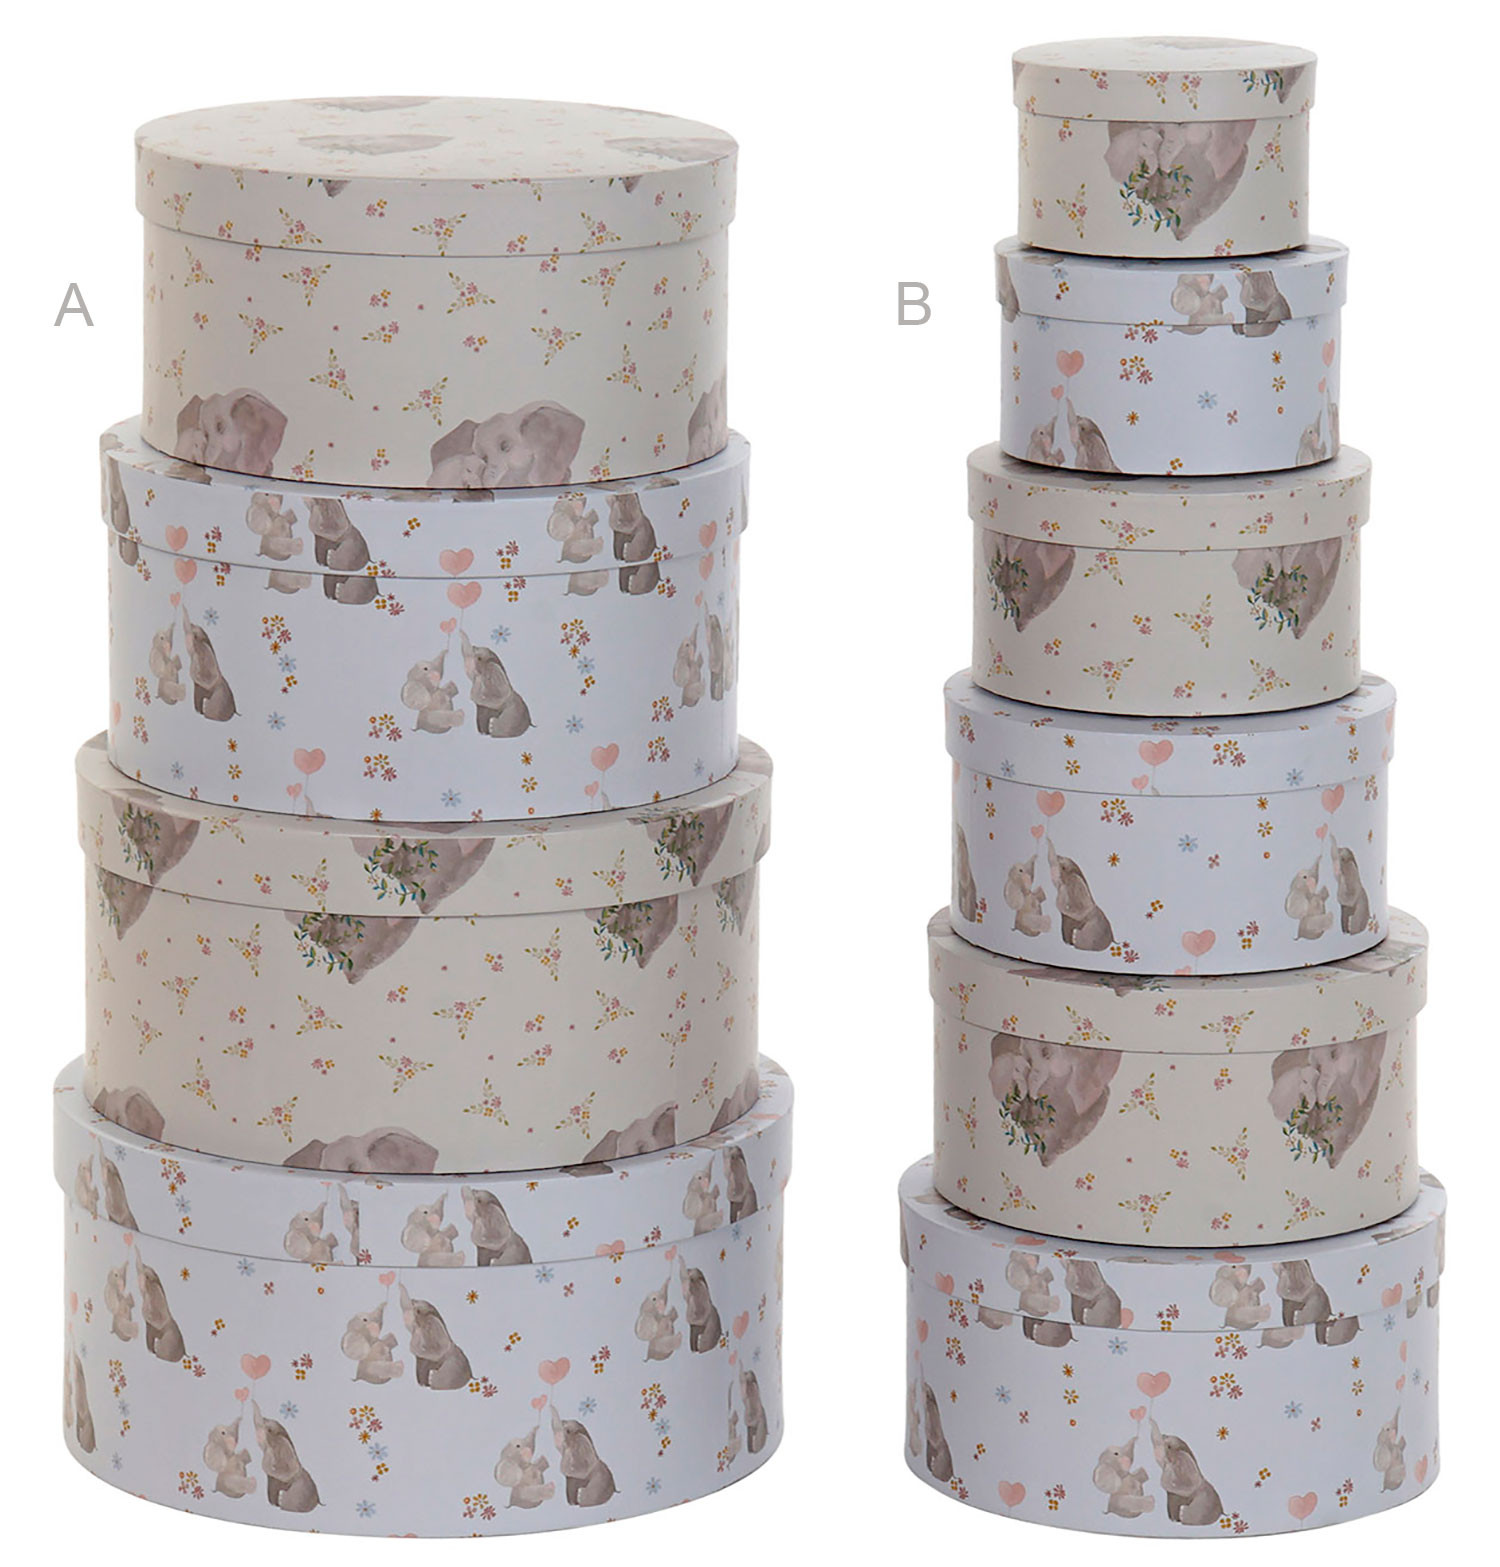 Cardboard boxes, Round, Design, Elephant, Set of Cardboard Boxes 37,5x37x5x18 cm